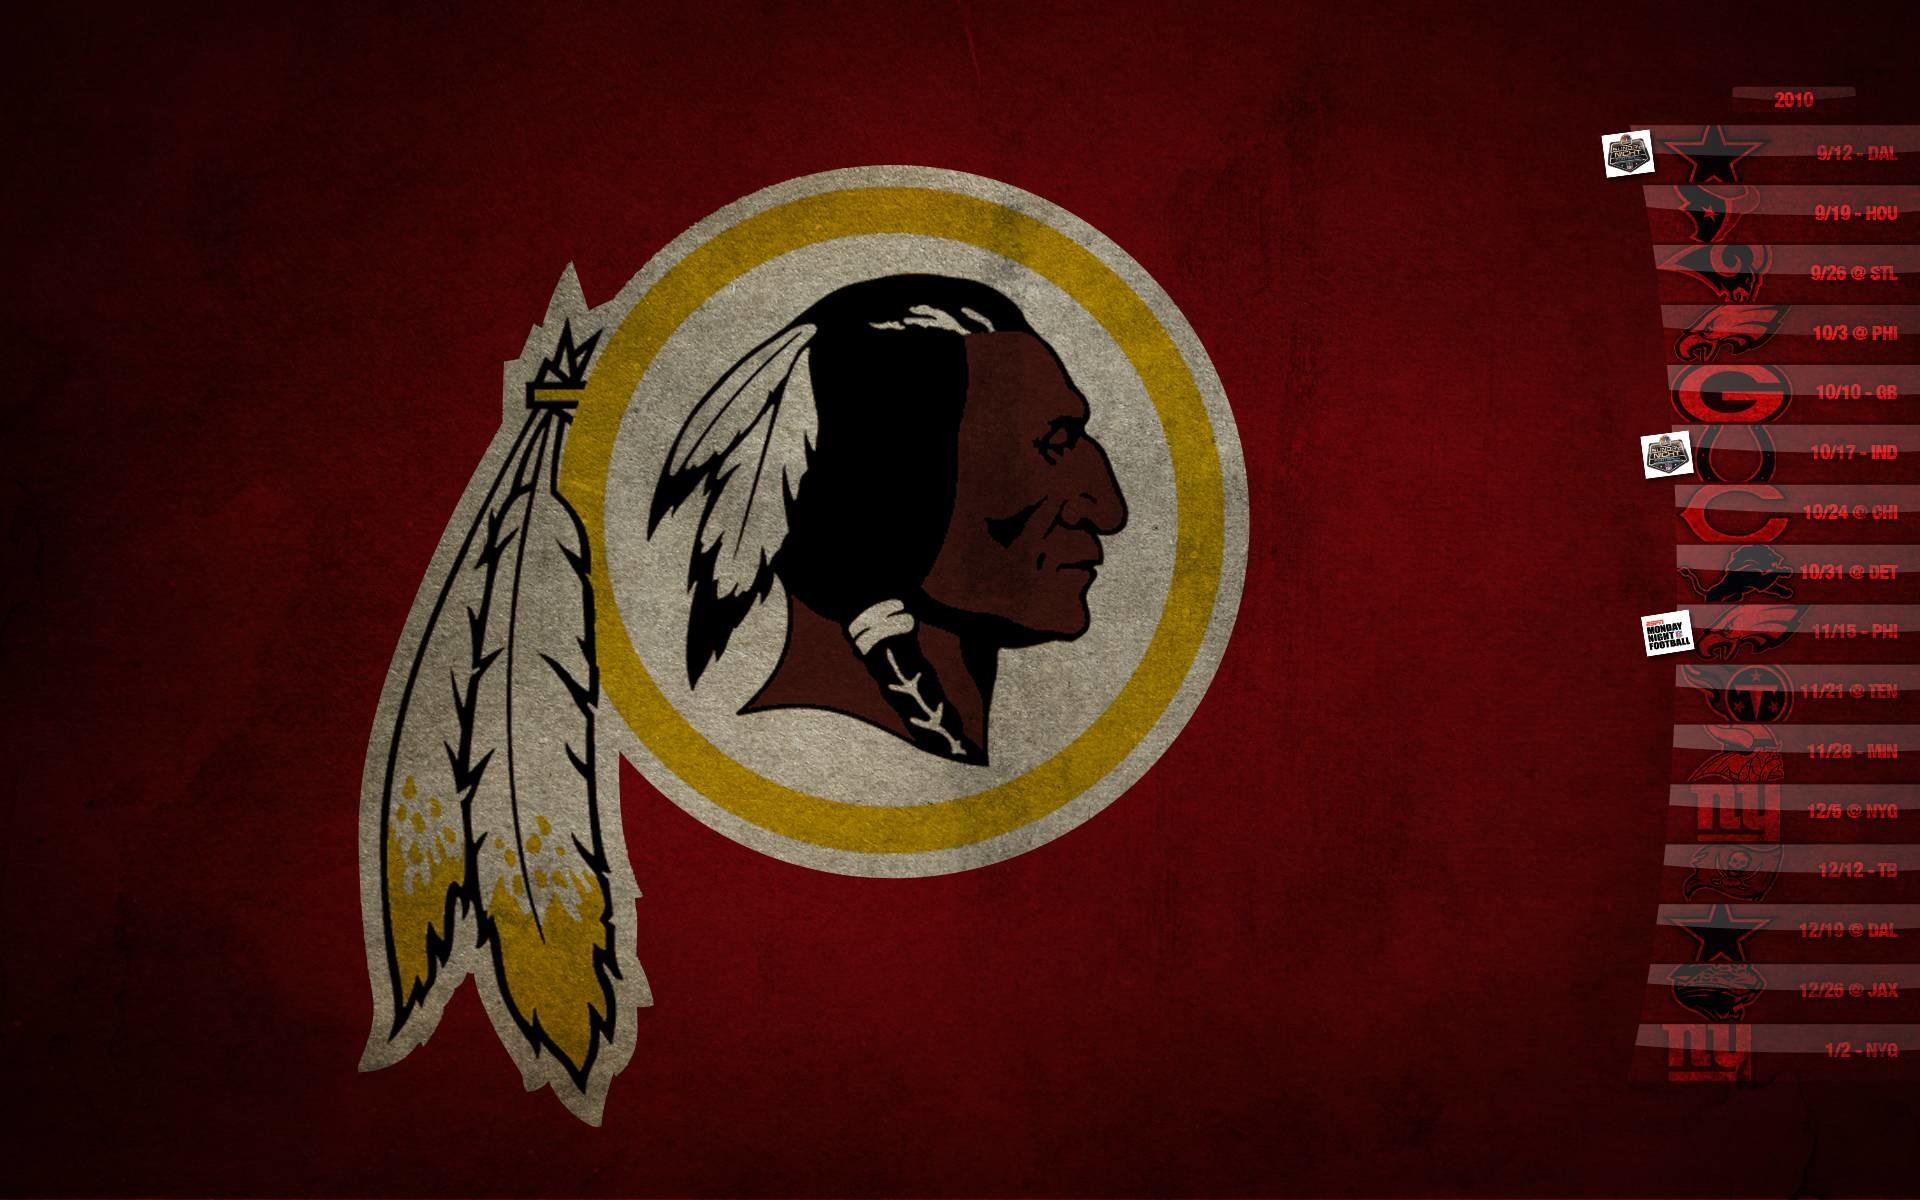 Washington Redskins Wallpapers – Wallpaper Cave